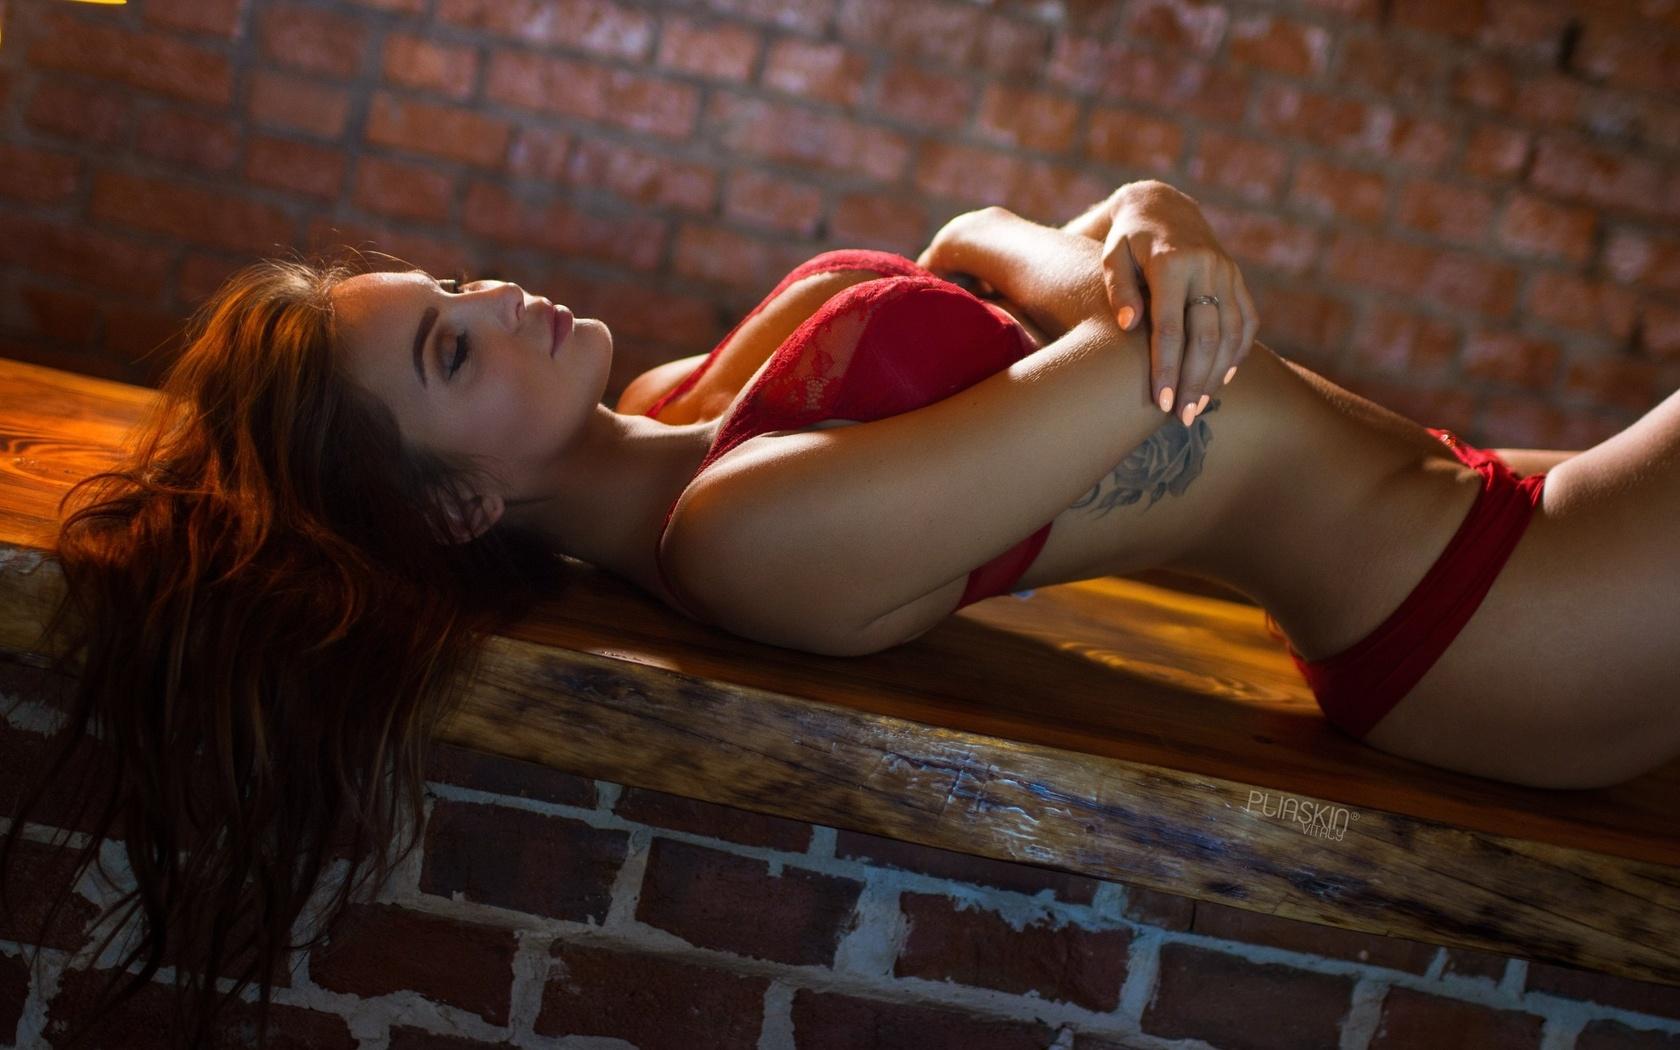 sofia kazakova, women, brunette, red lingerie, tattoo, arched back, closed eyes, bricks, portrait, painted nails, belly, arms crossed, девушка, шатенка, закрытые глаза, макияж, загорелая, фигурка, тату, нижнее белье